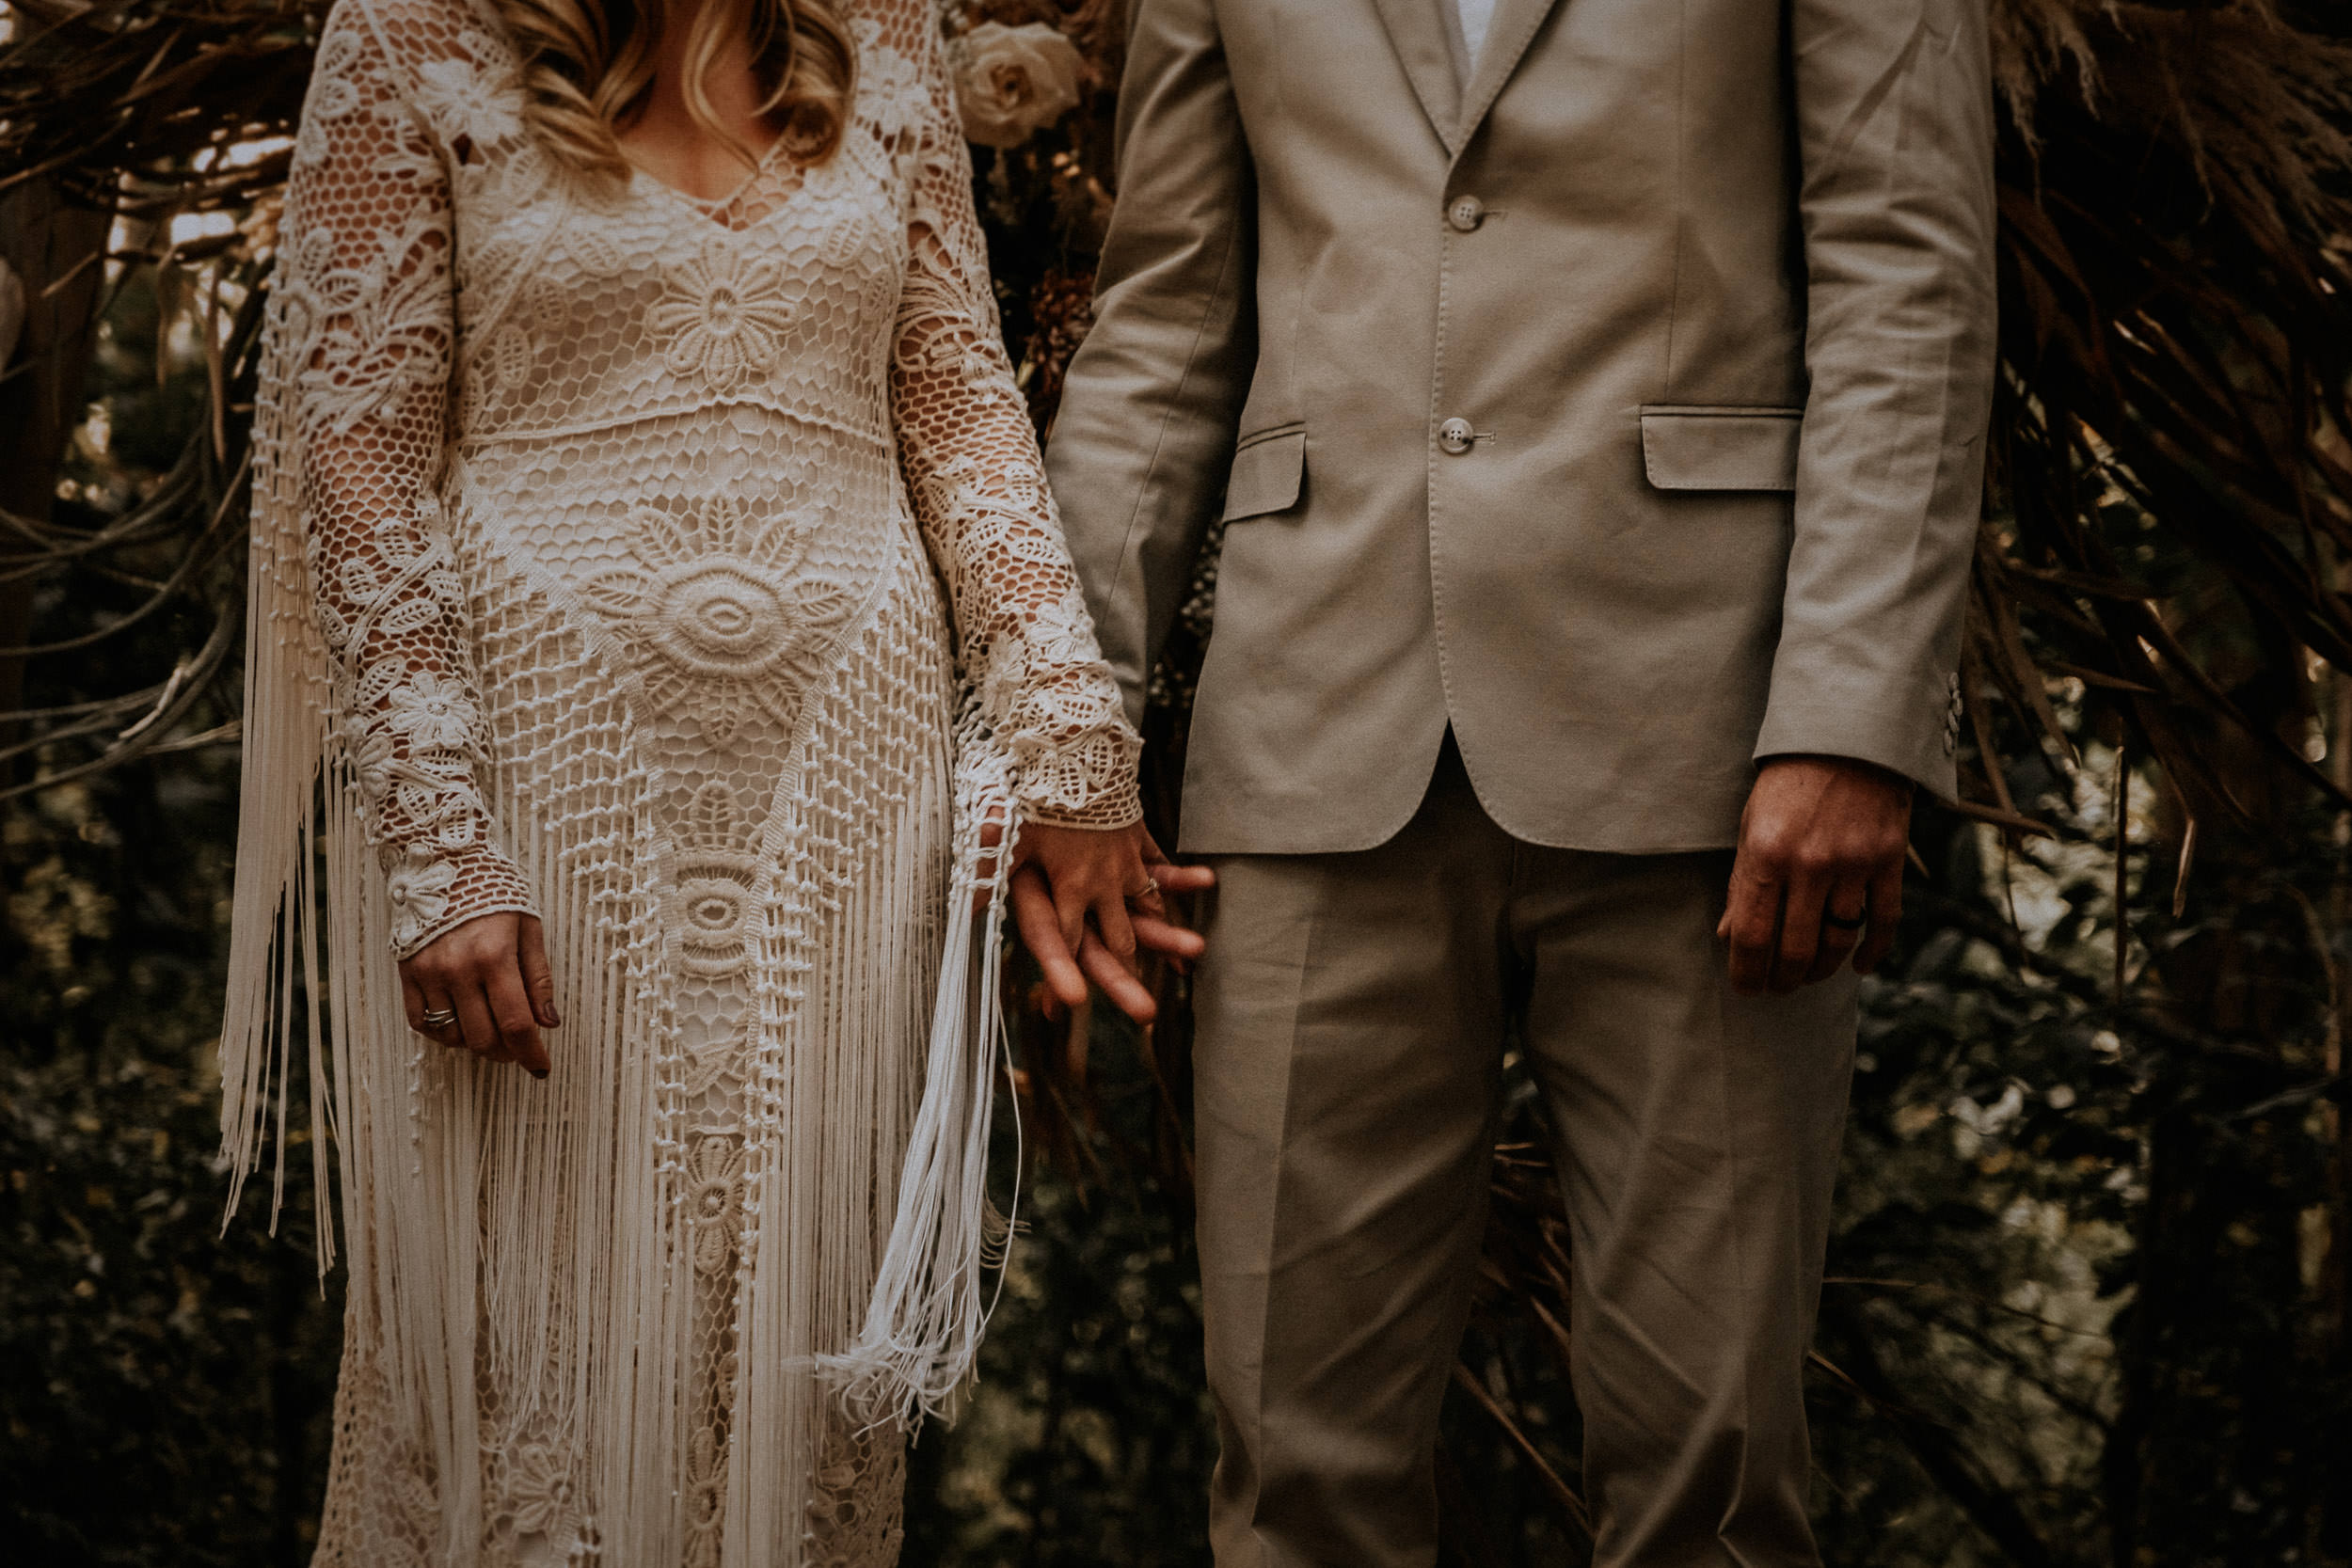 S&A Elopement - Kings & Thieves - Shred 'Til Dead - Central Coast Beach Forest Wedding - 234.jpg